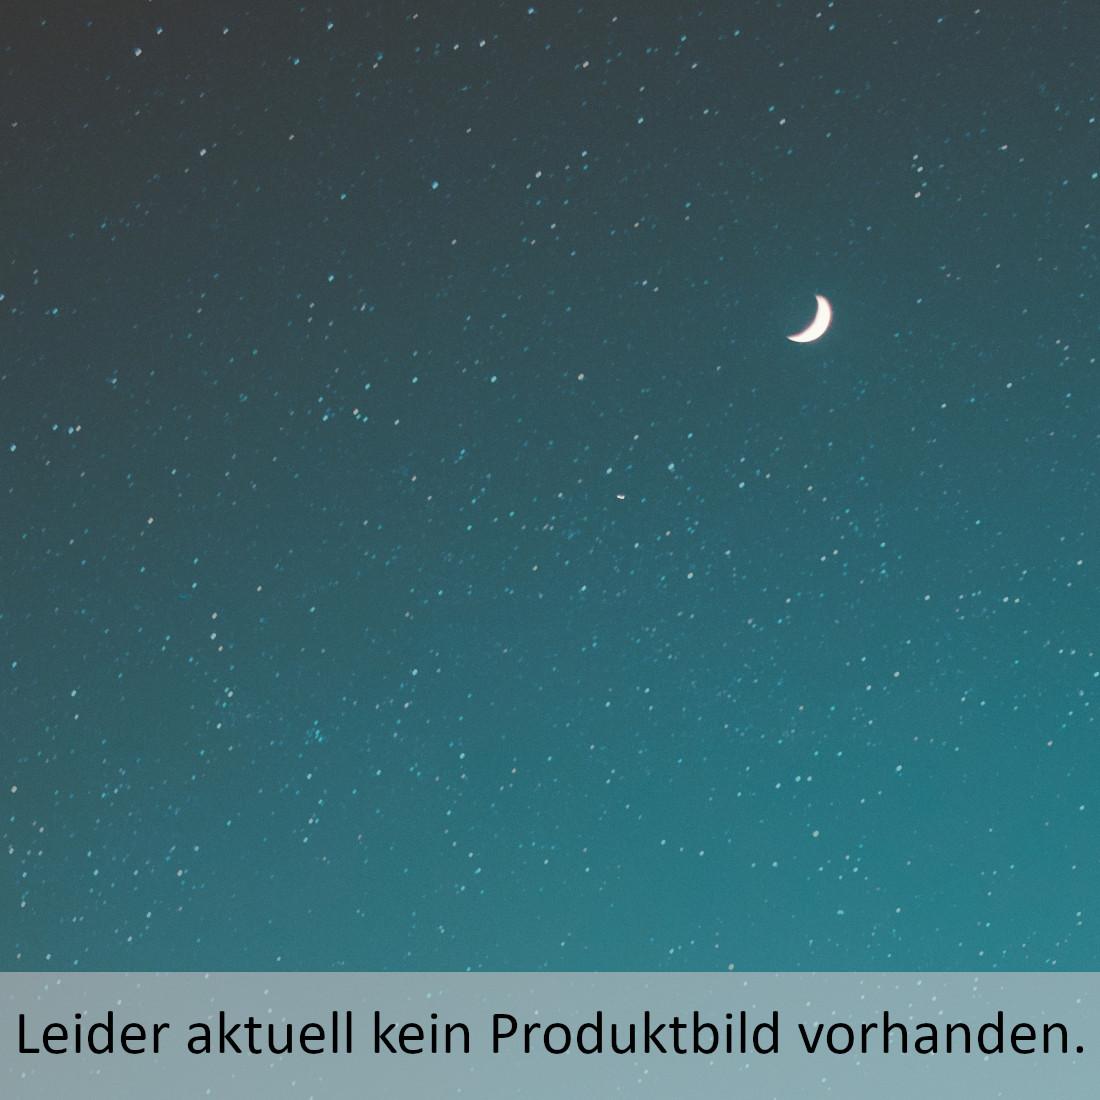 Zeit mit Gott Wübbe, Johannes/Baumgart, Christoph/Bölle, Lydia u a 9783460280441